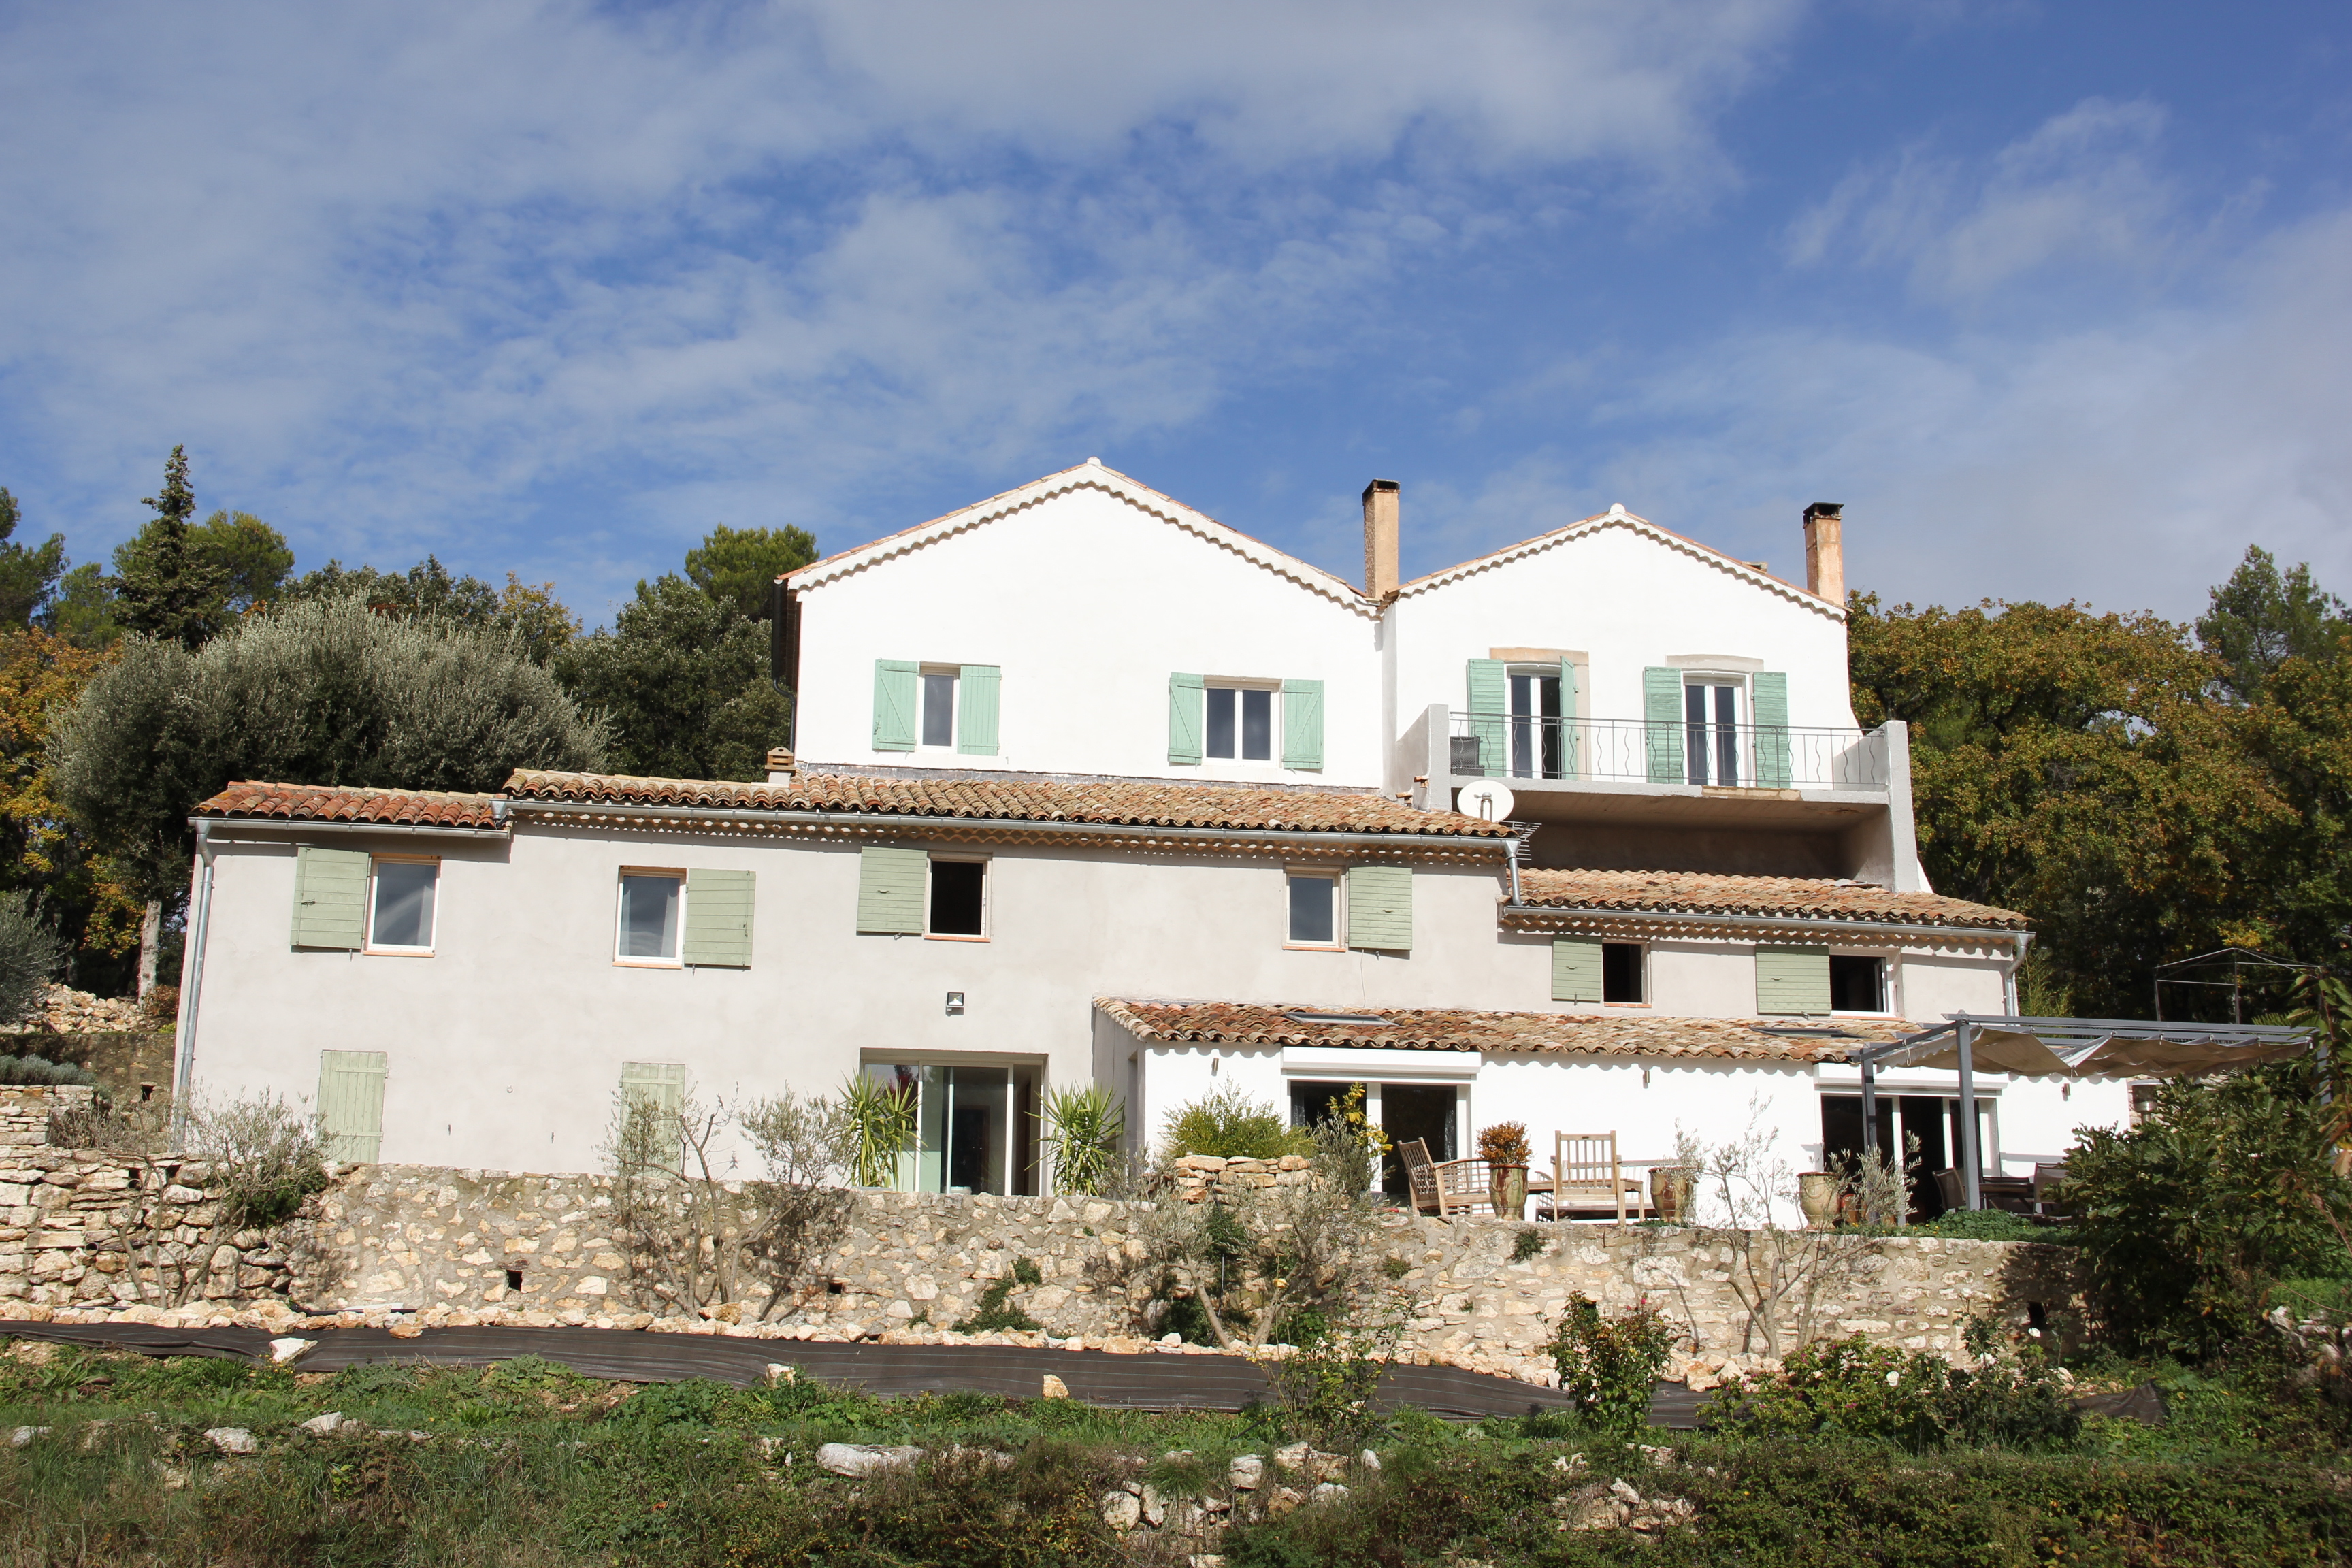 Puyricard aix en provence agrada agence immobili re - Salon immobilier aix en provence ...